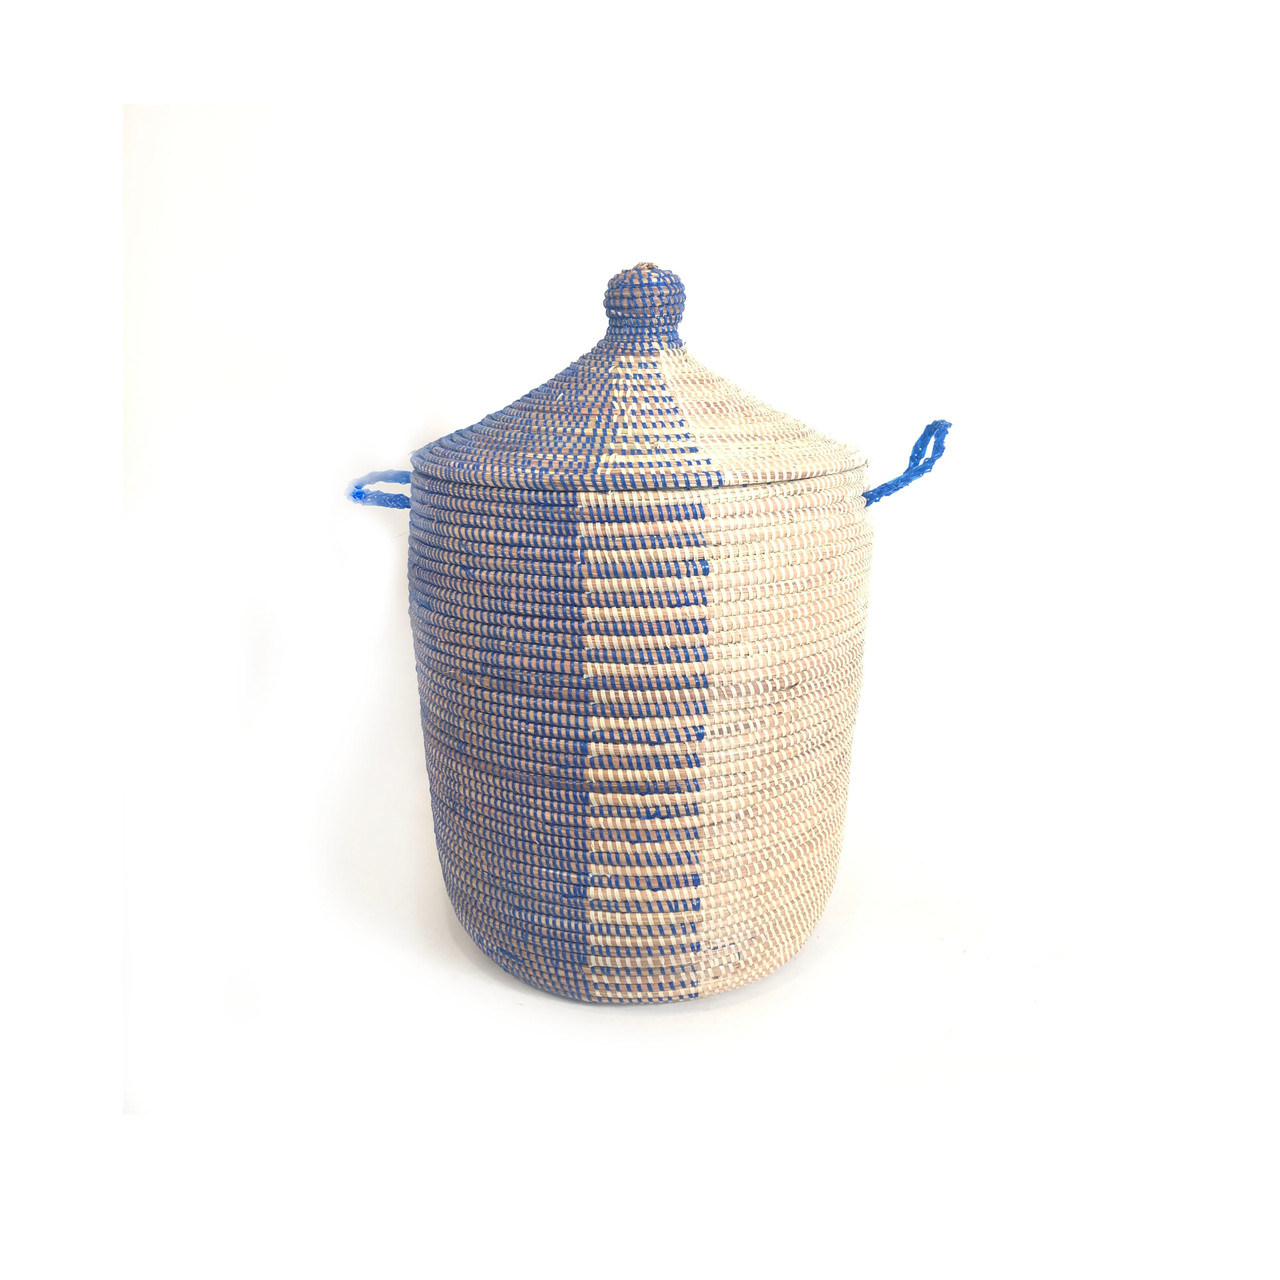 Medium Graphic Basket   Navy + White